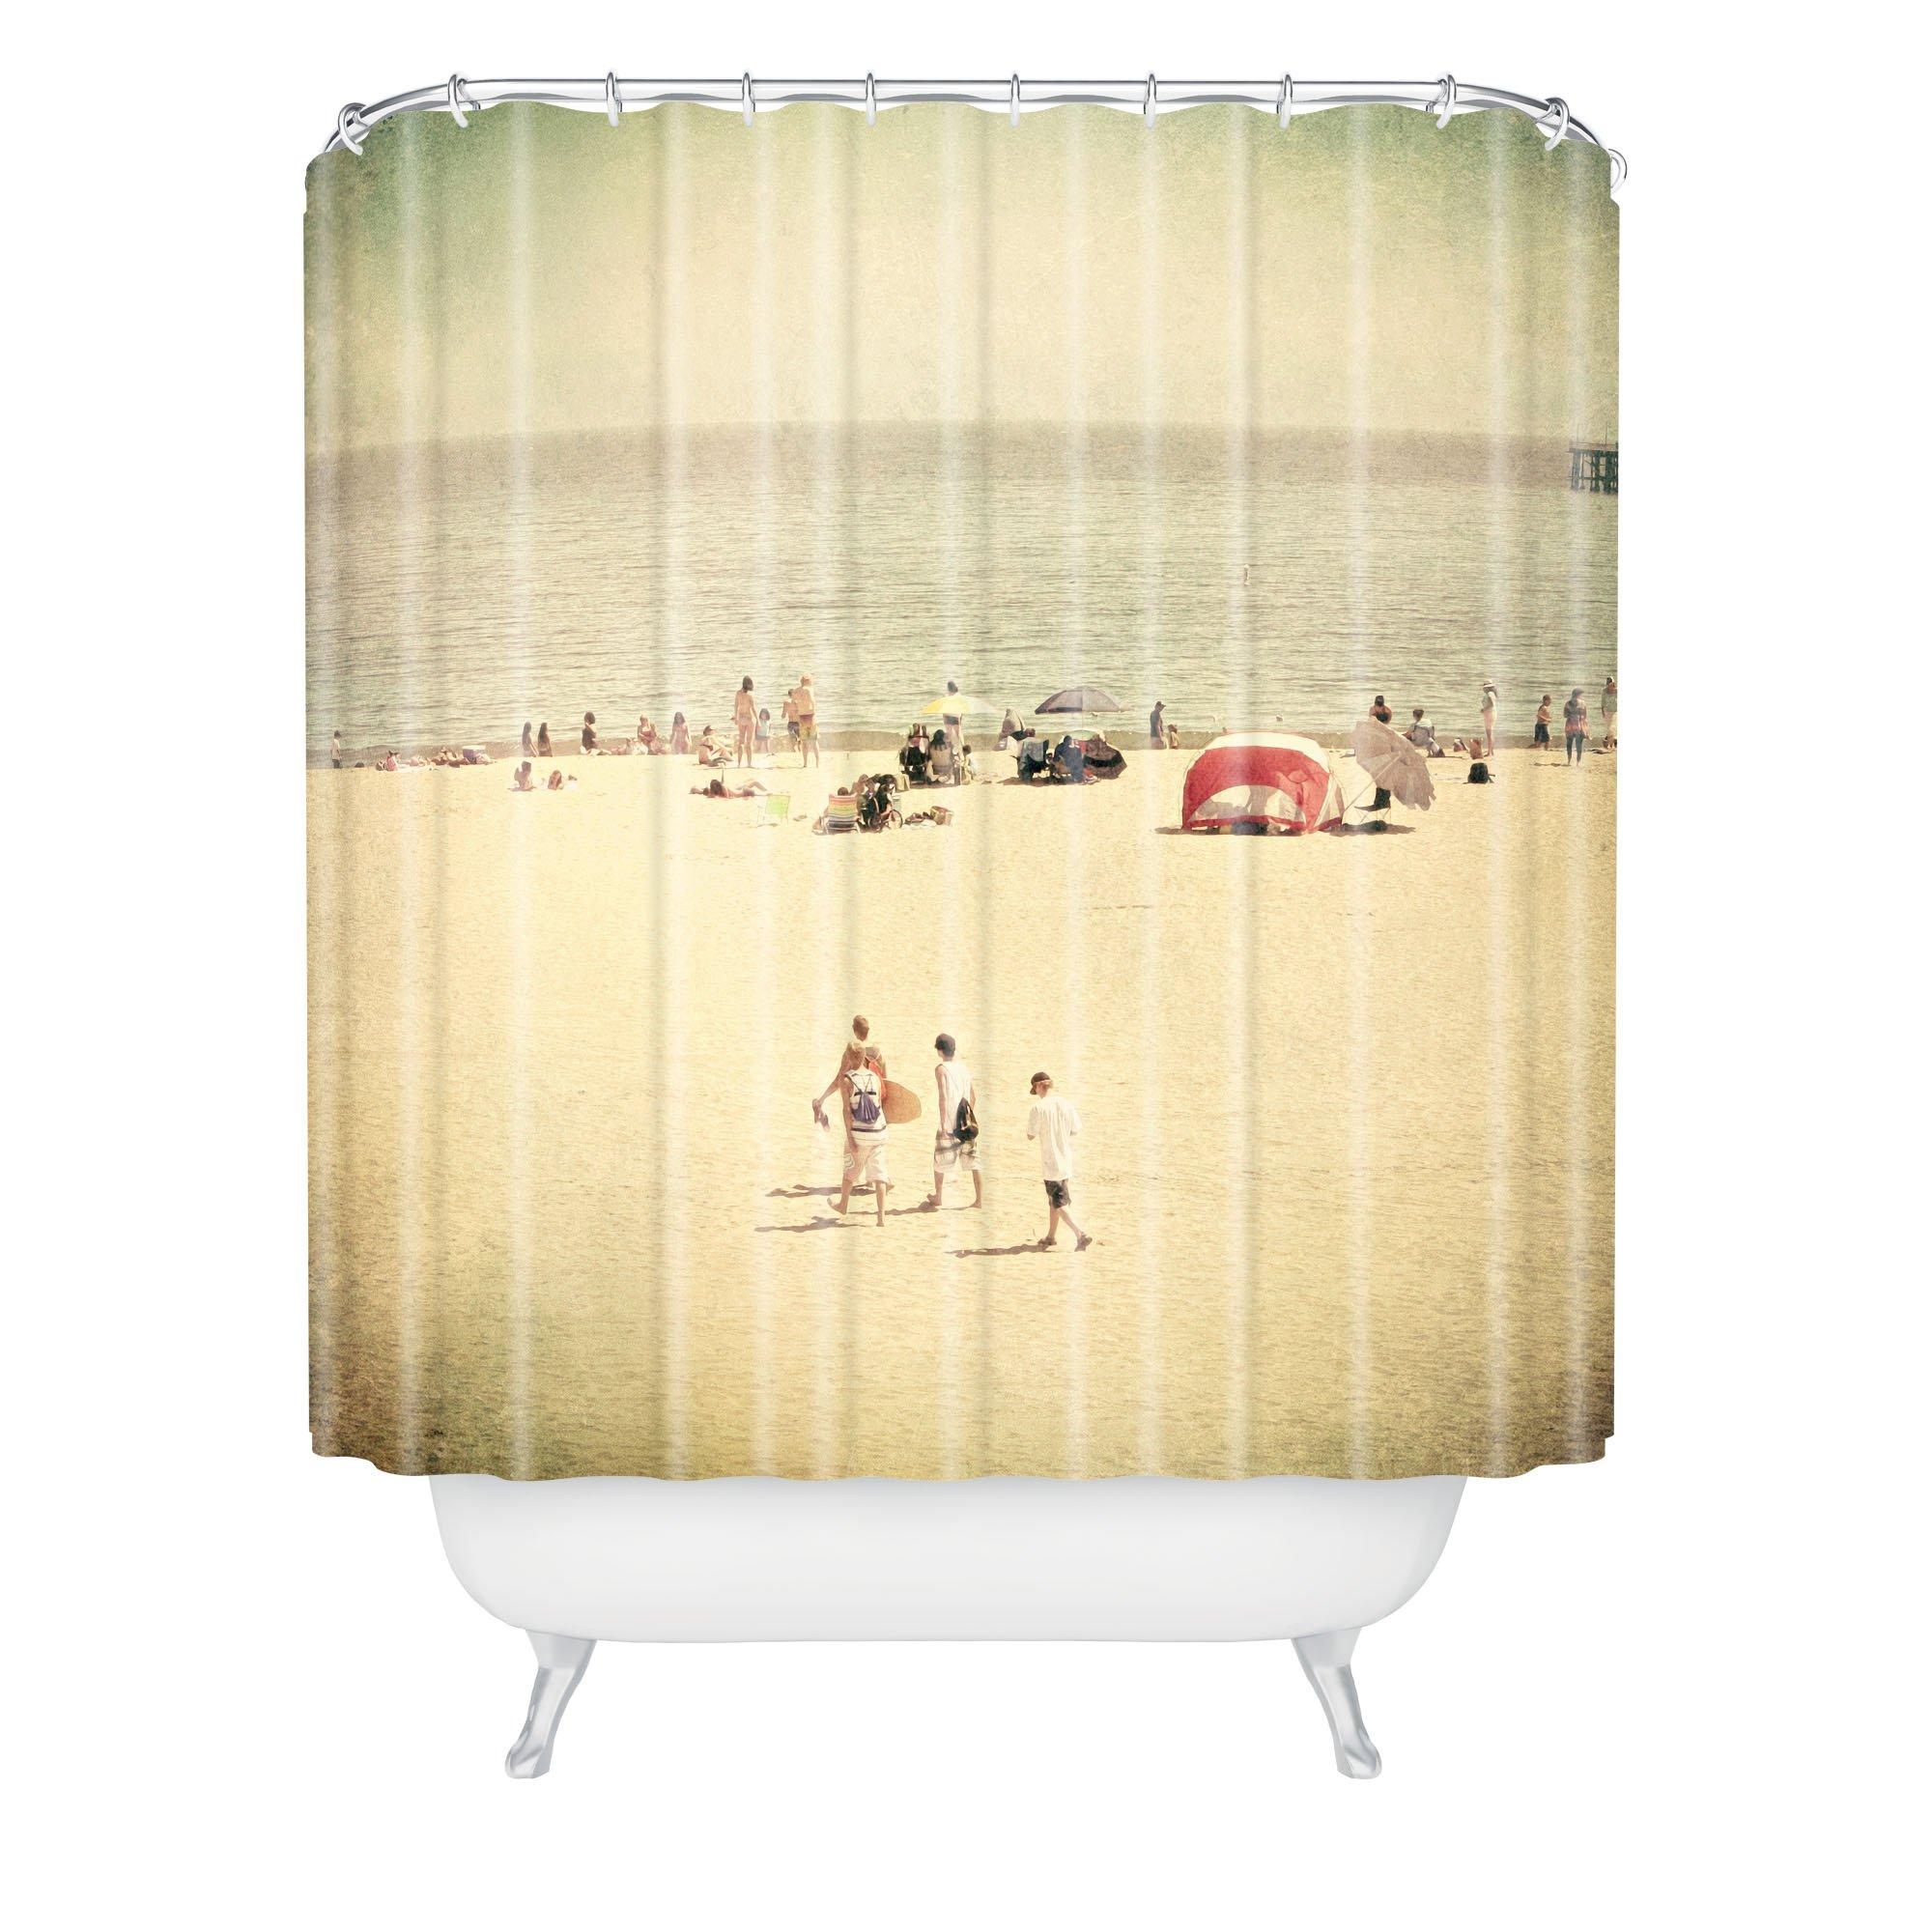 Deny Designs Shannon Clark Boys Of Summer Shower Curtain, 69'' x 90''